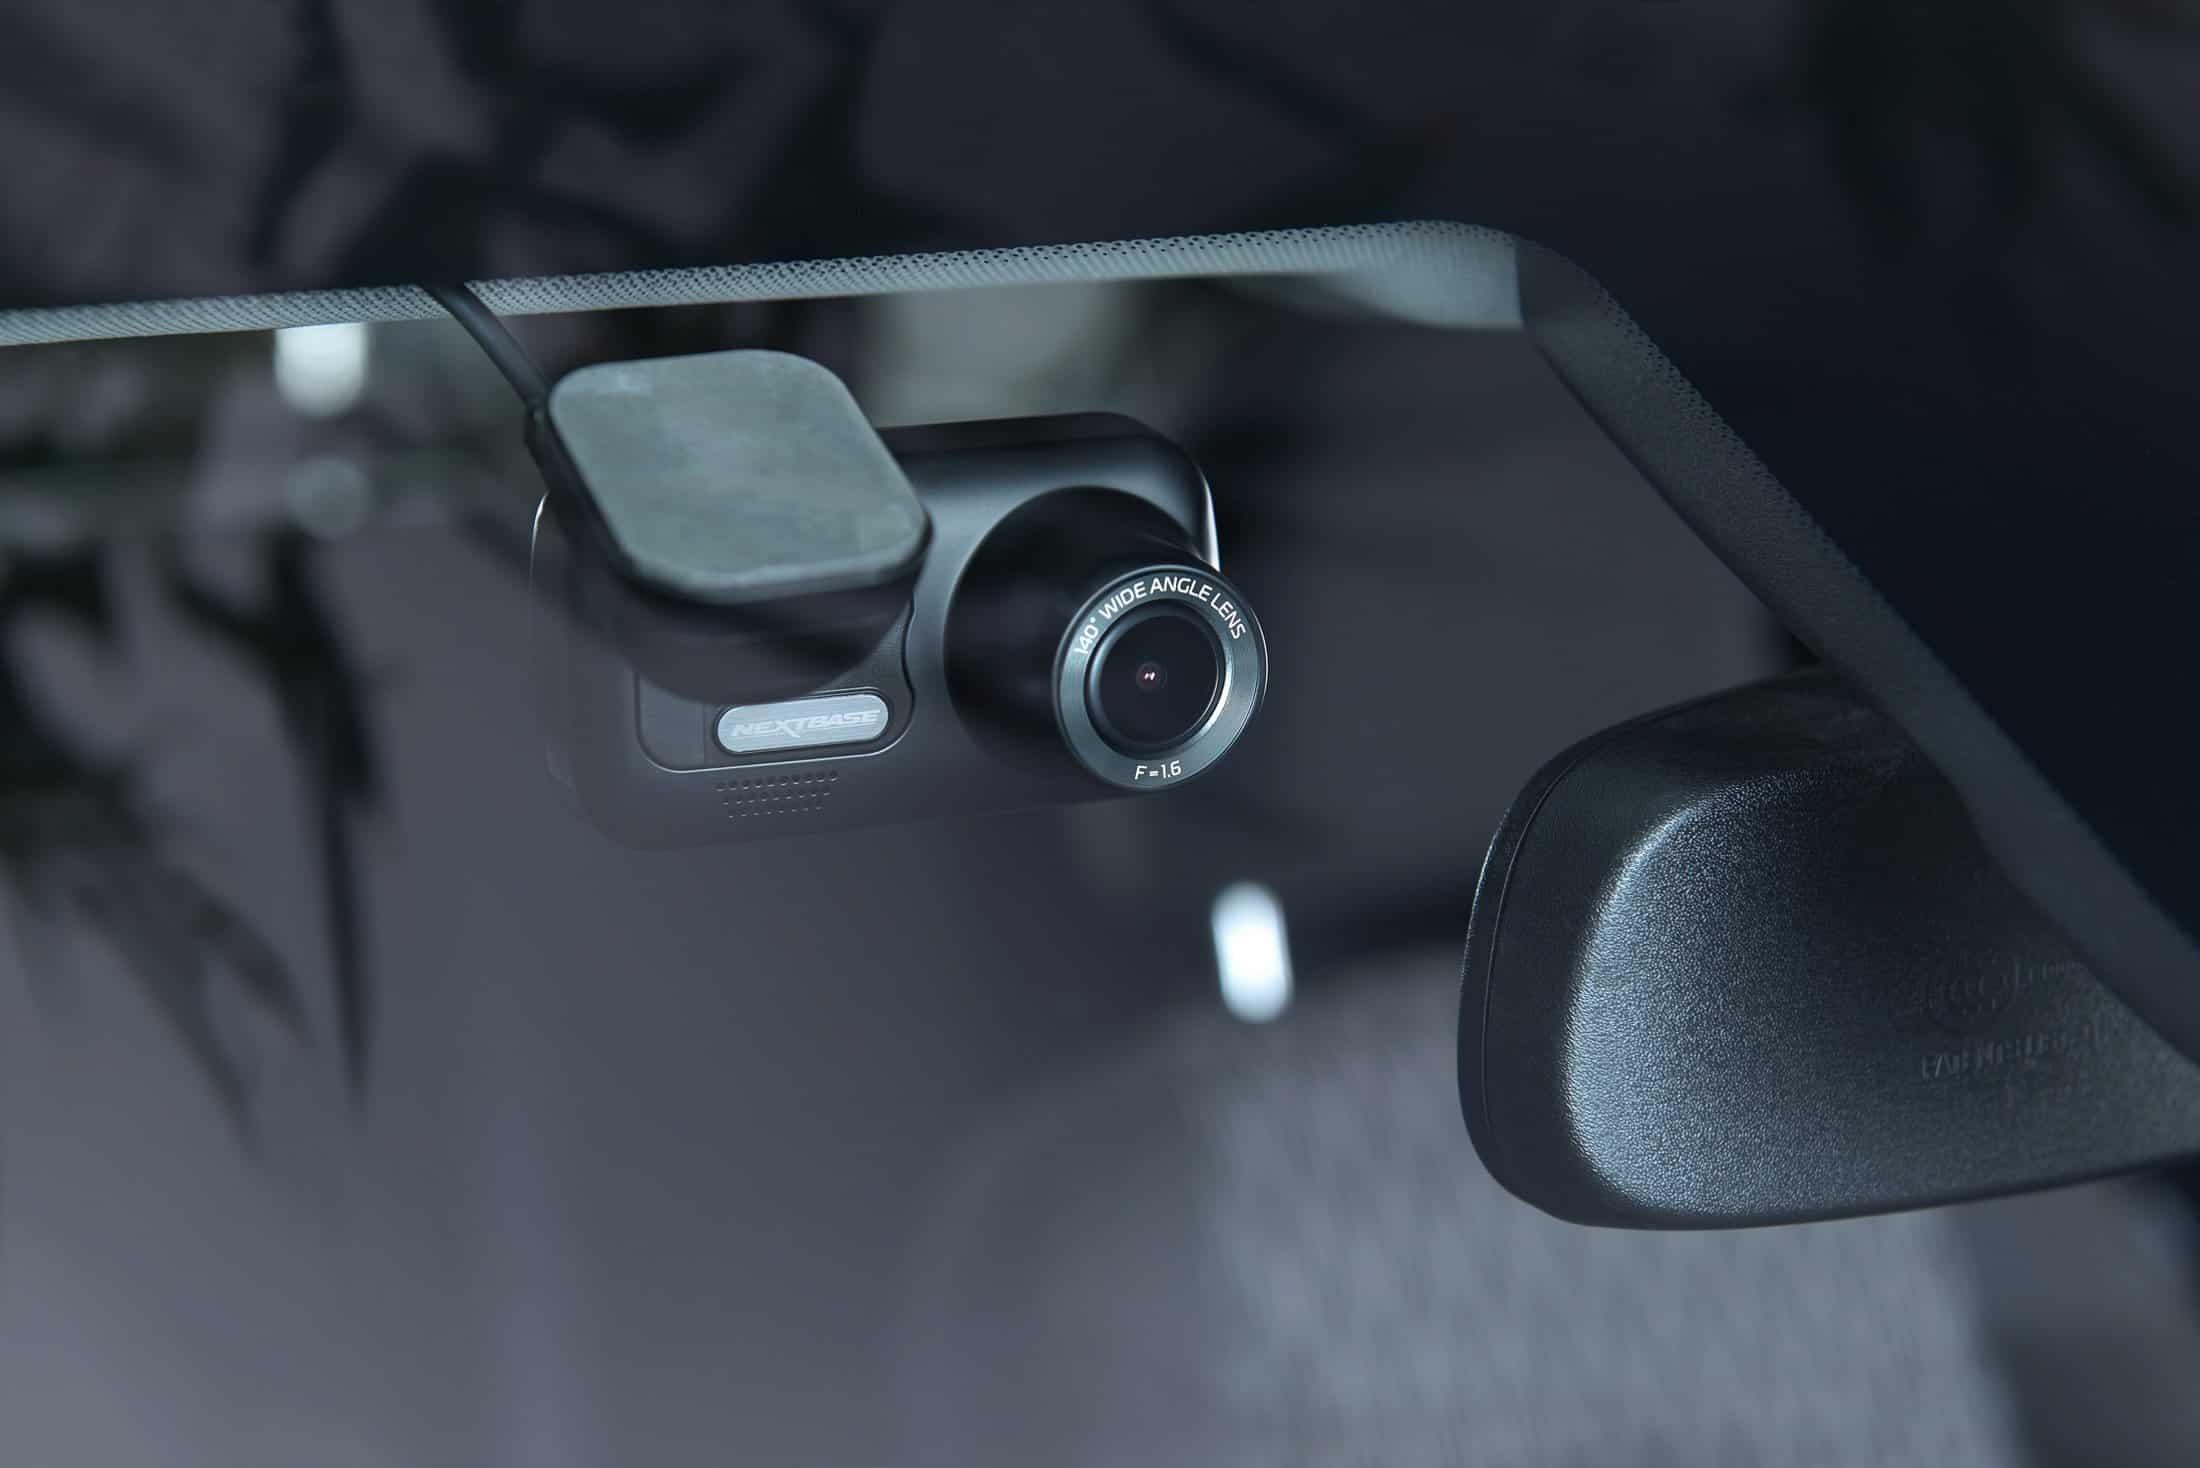 Wireless dash cam, a top tech gift